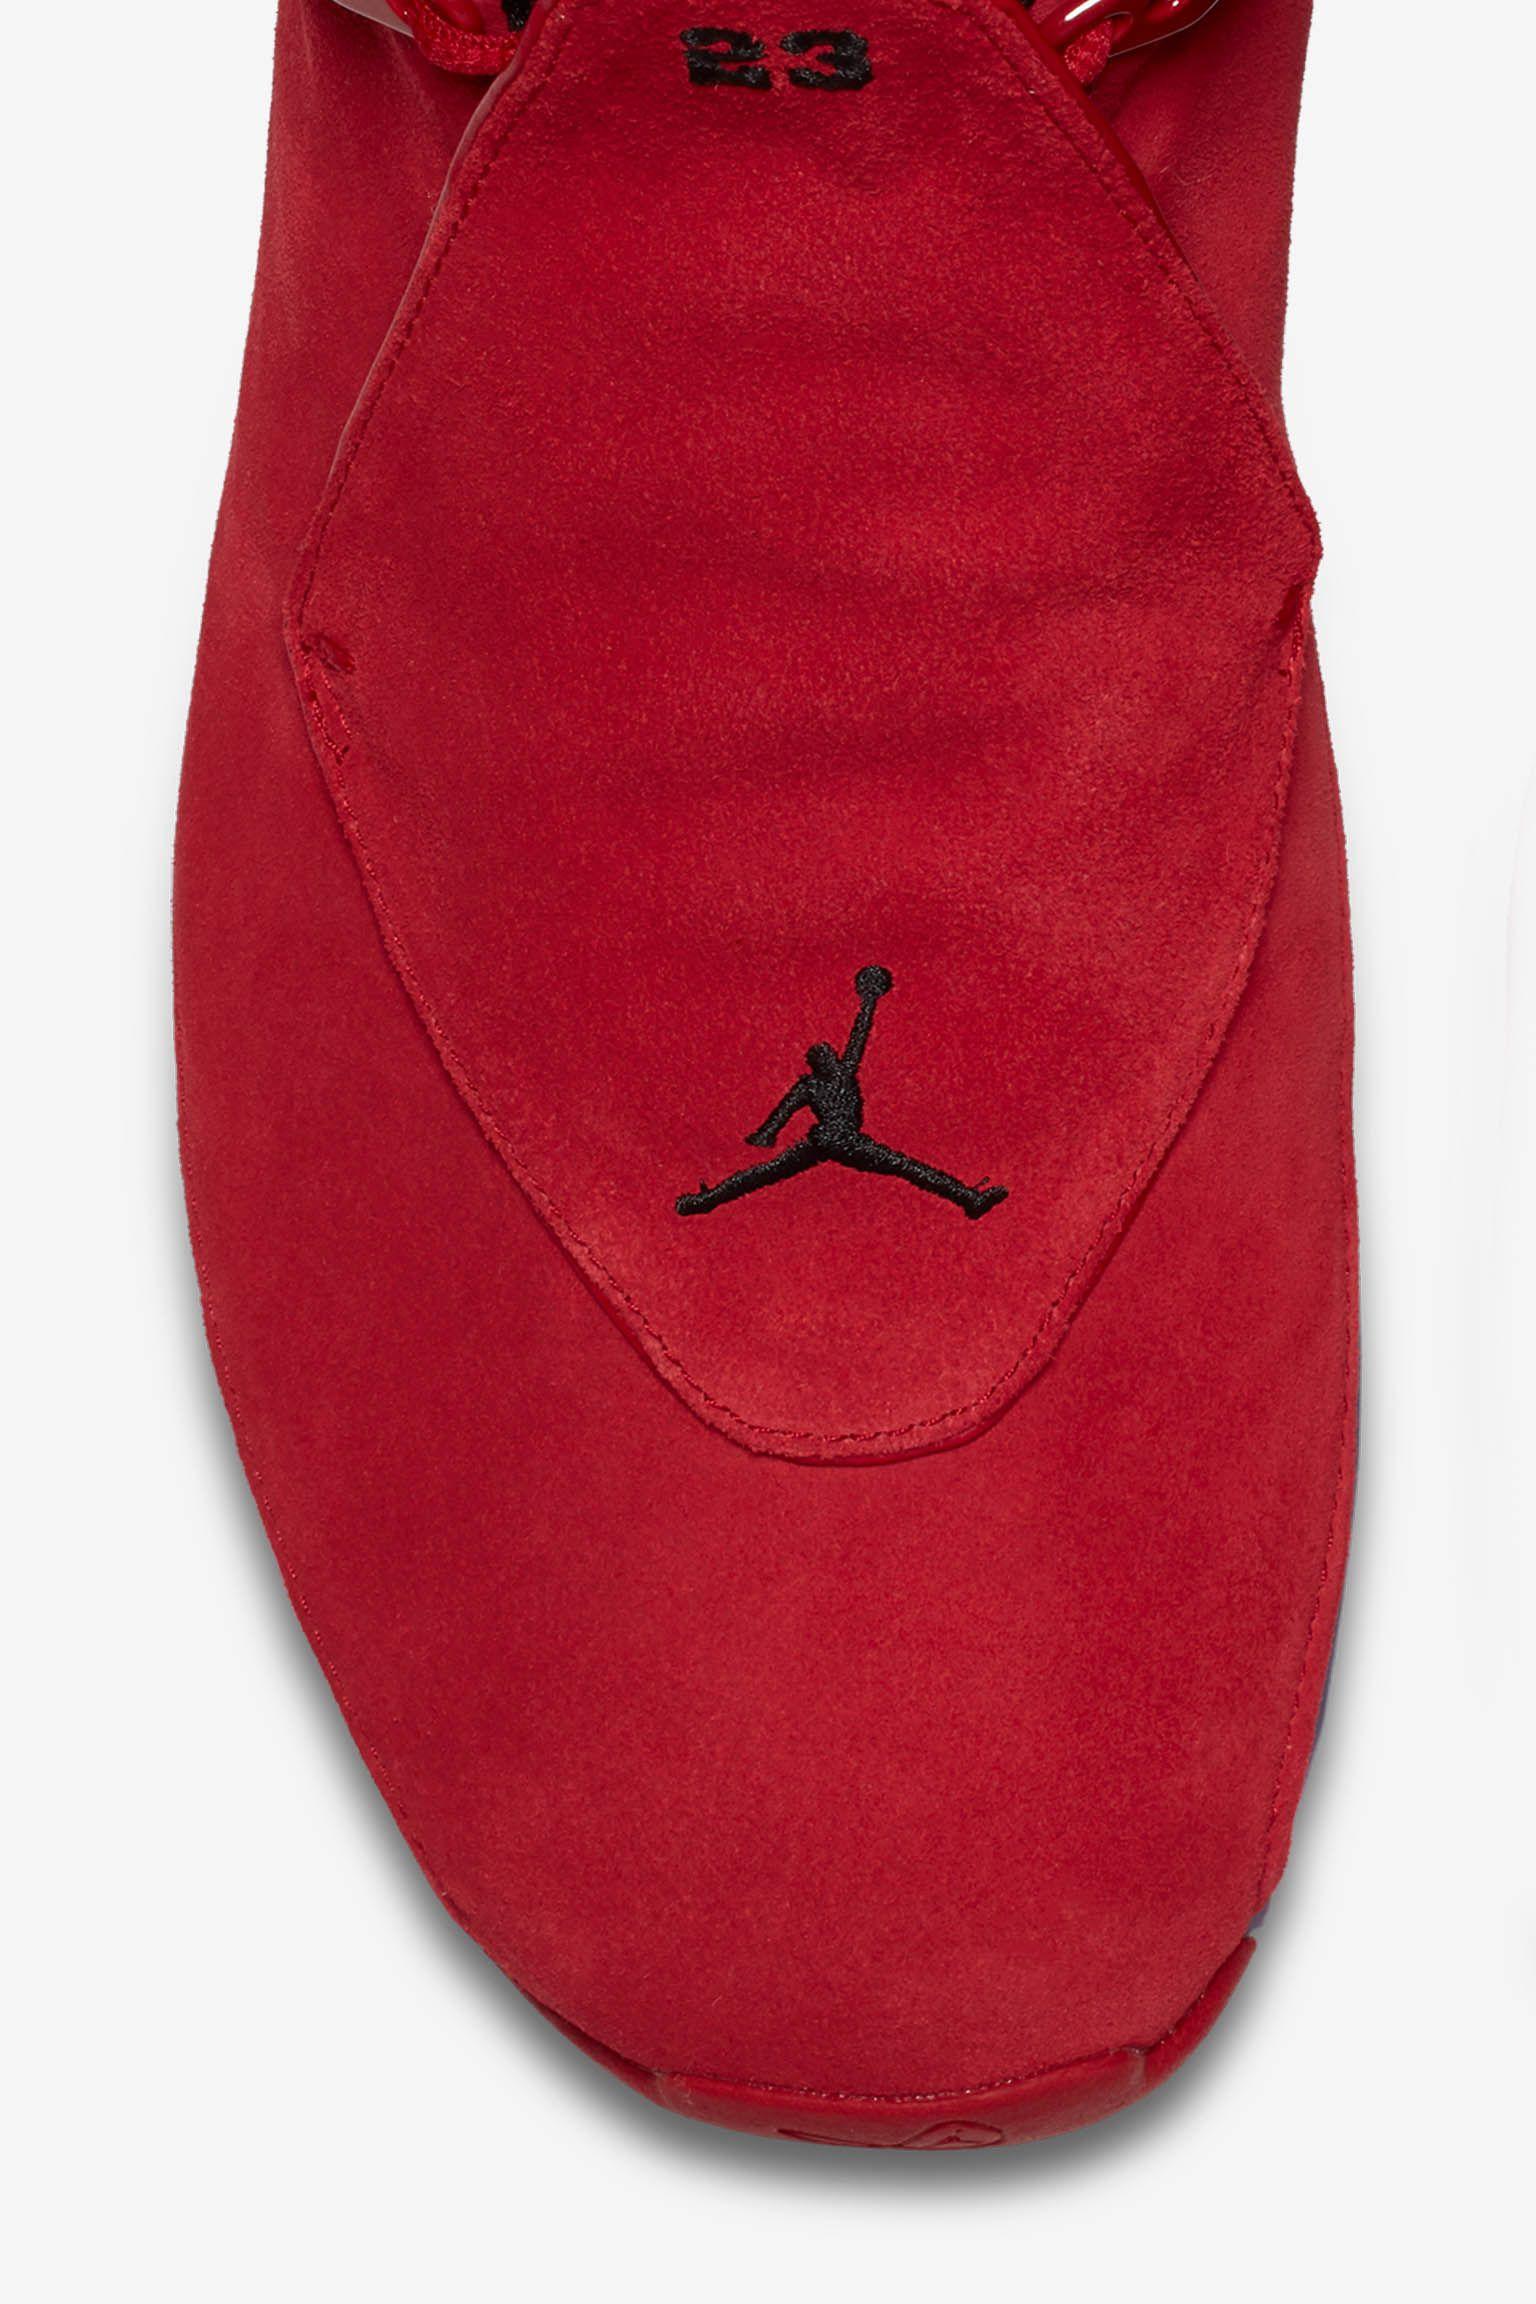 Air Jordan 18 'Gym Red & Black' Release Date